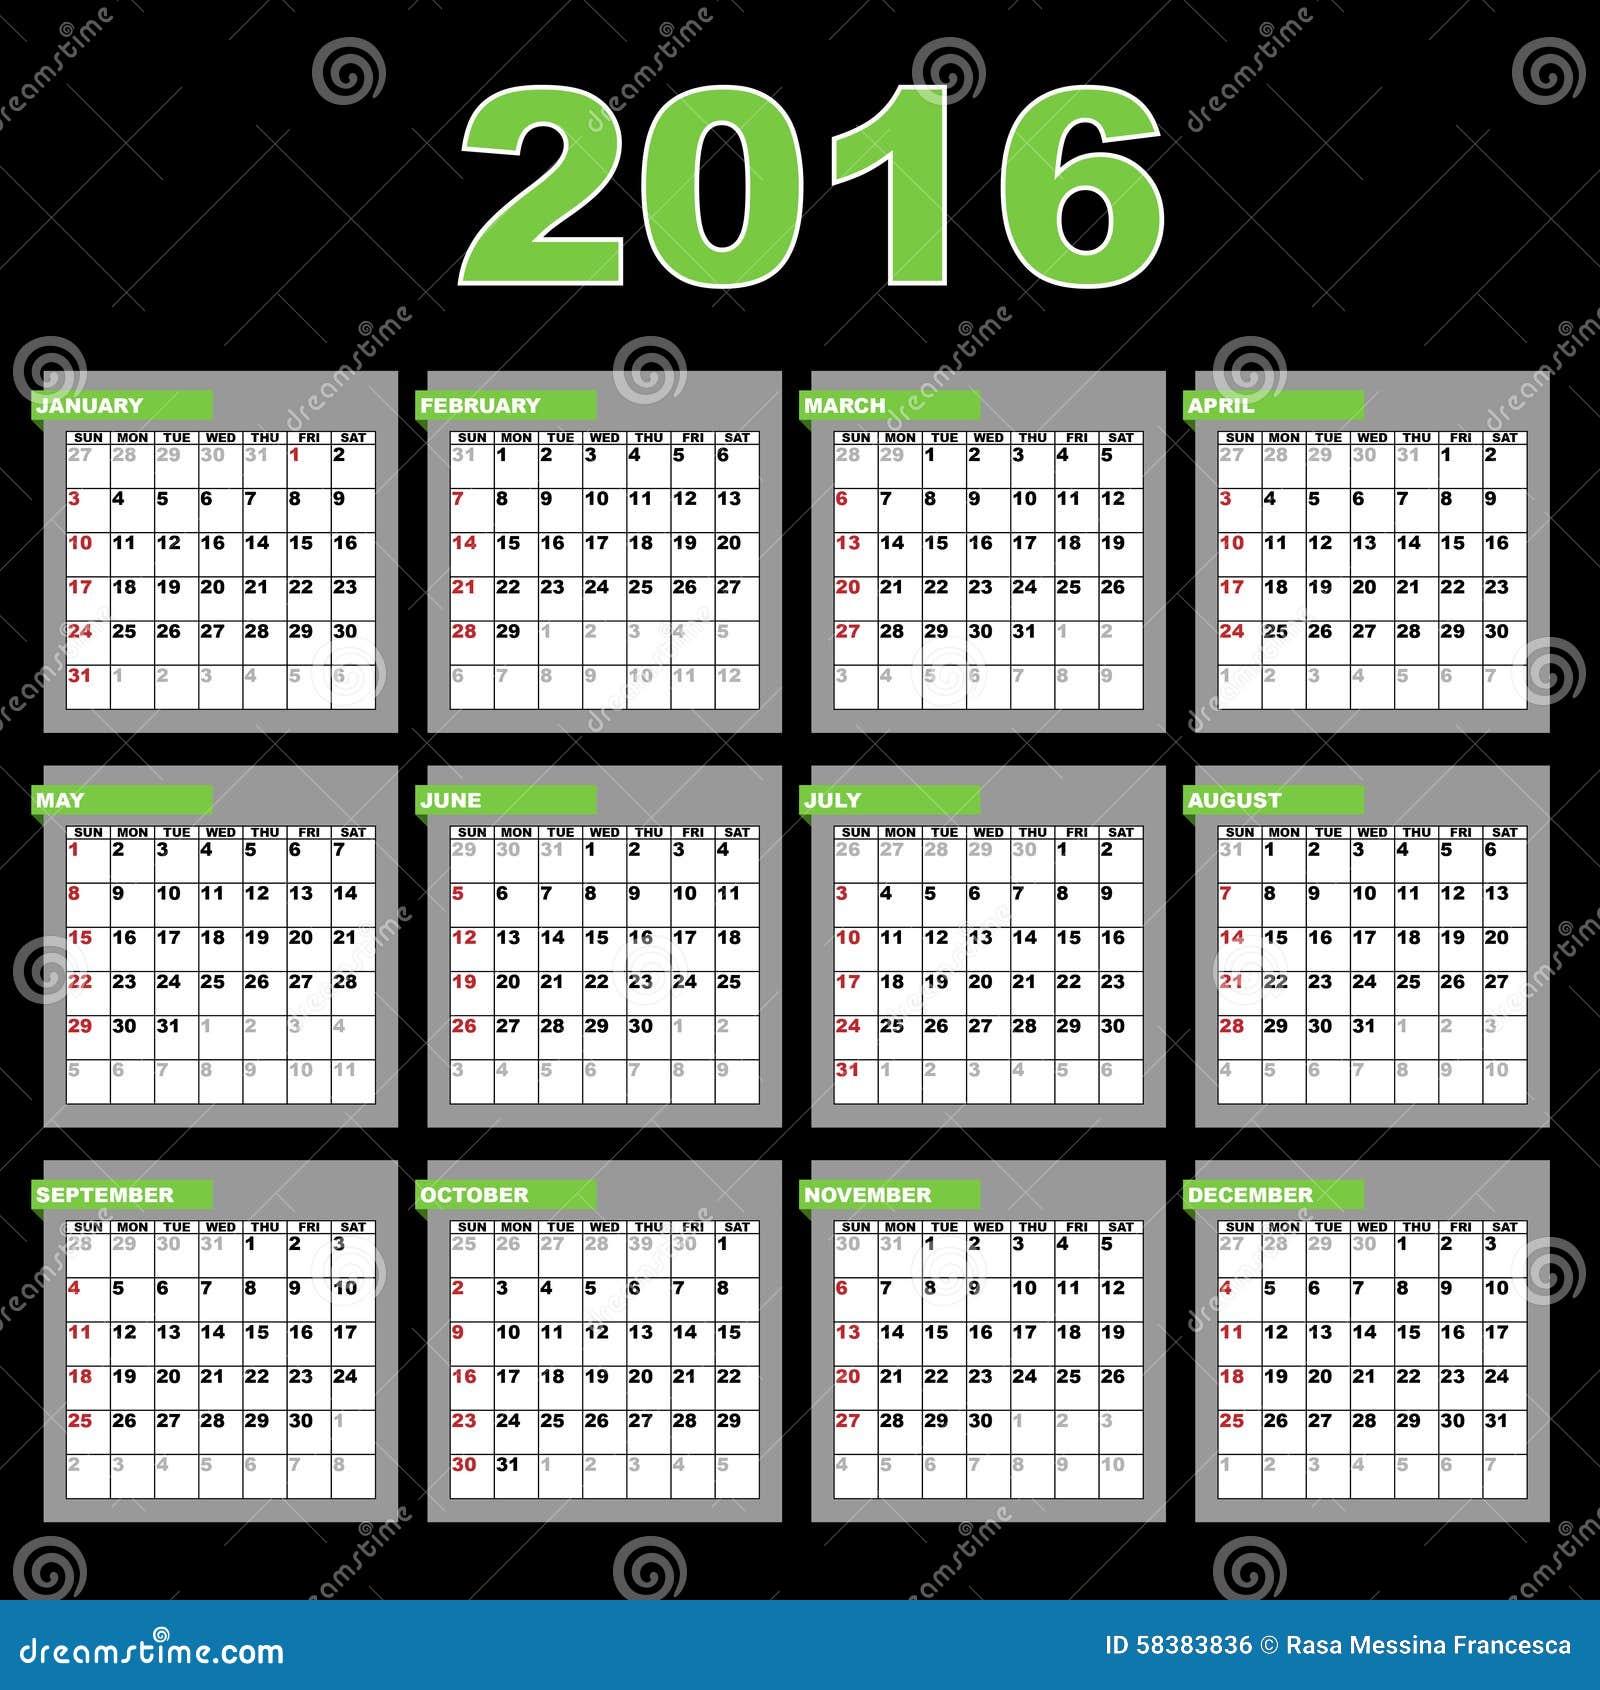 Calendar Design Eps File : Calendar stock vector illustration of annual